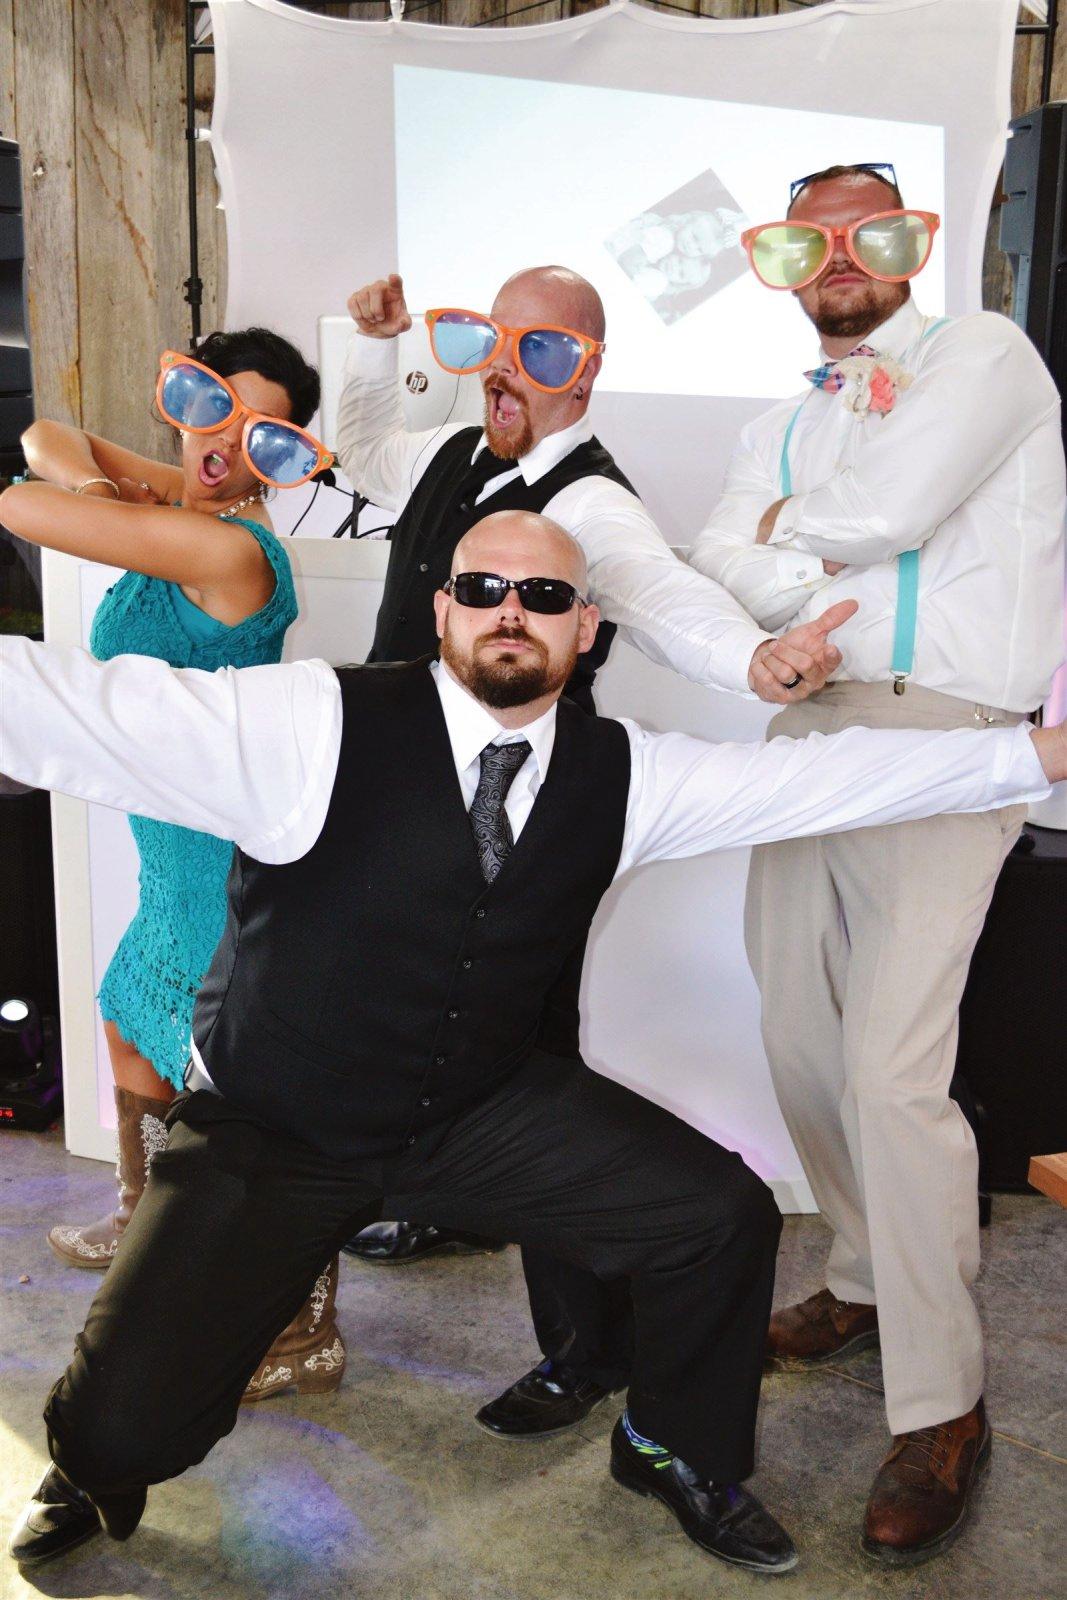 This was a fun wedding